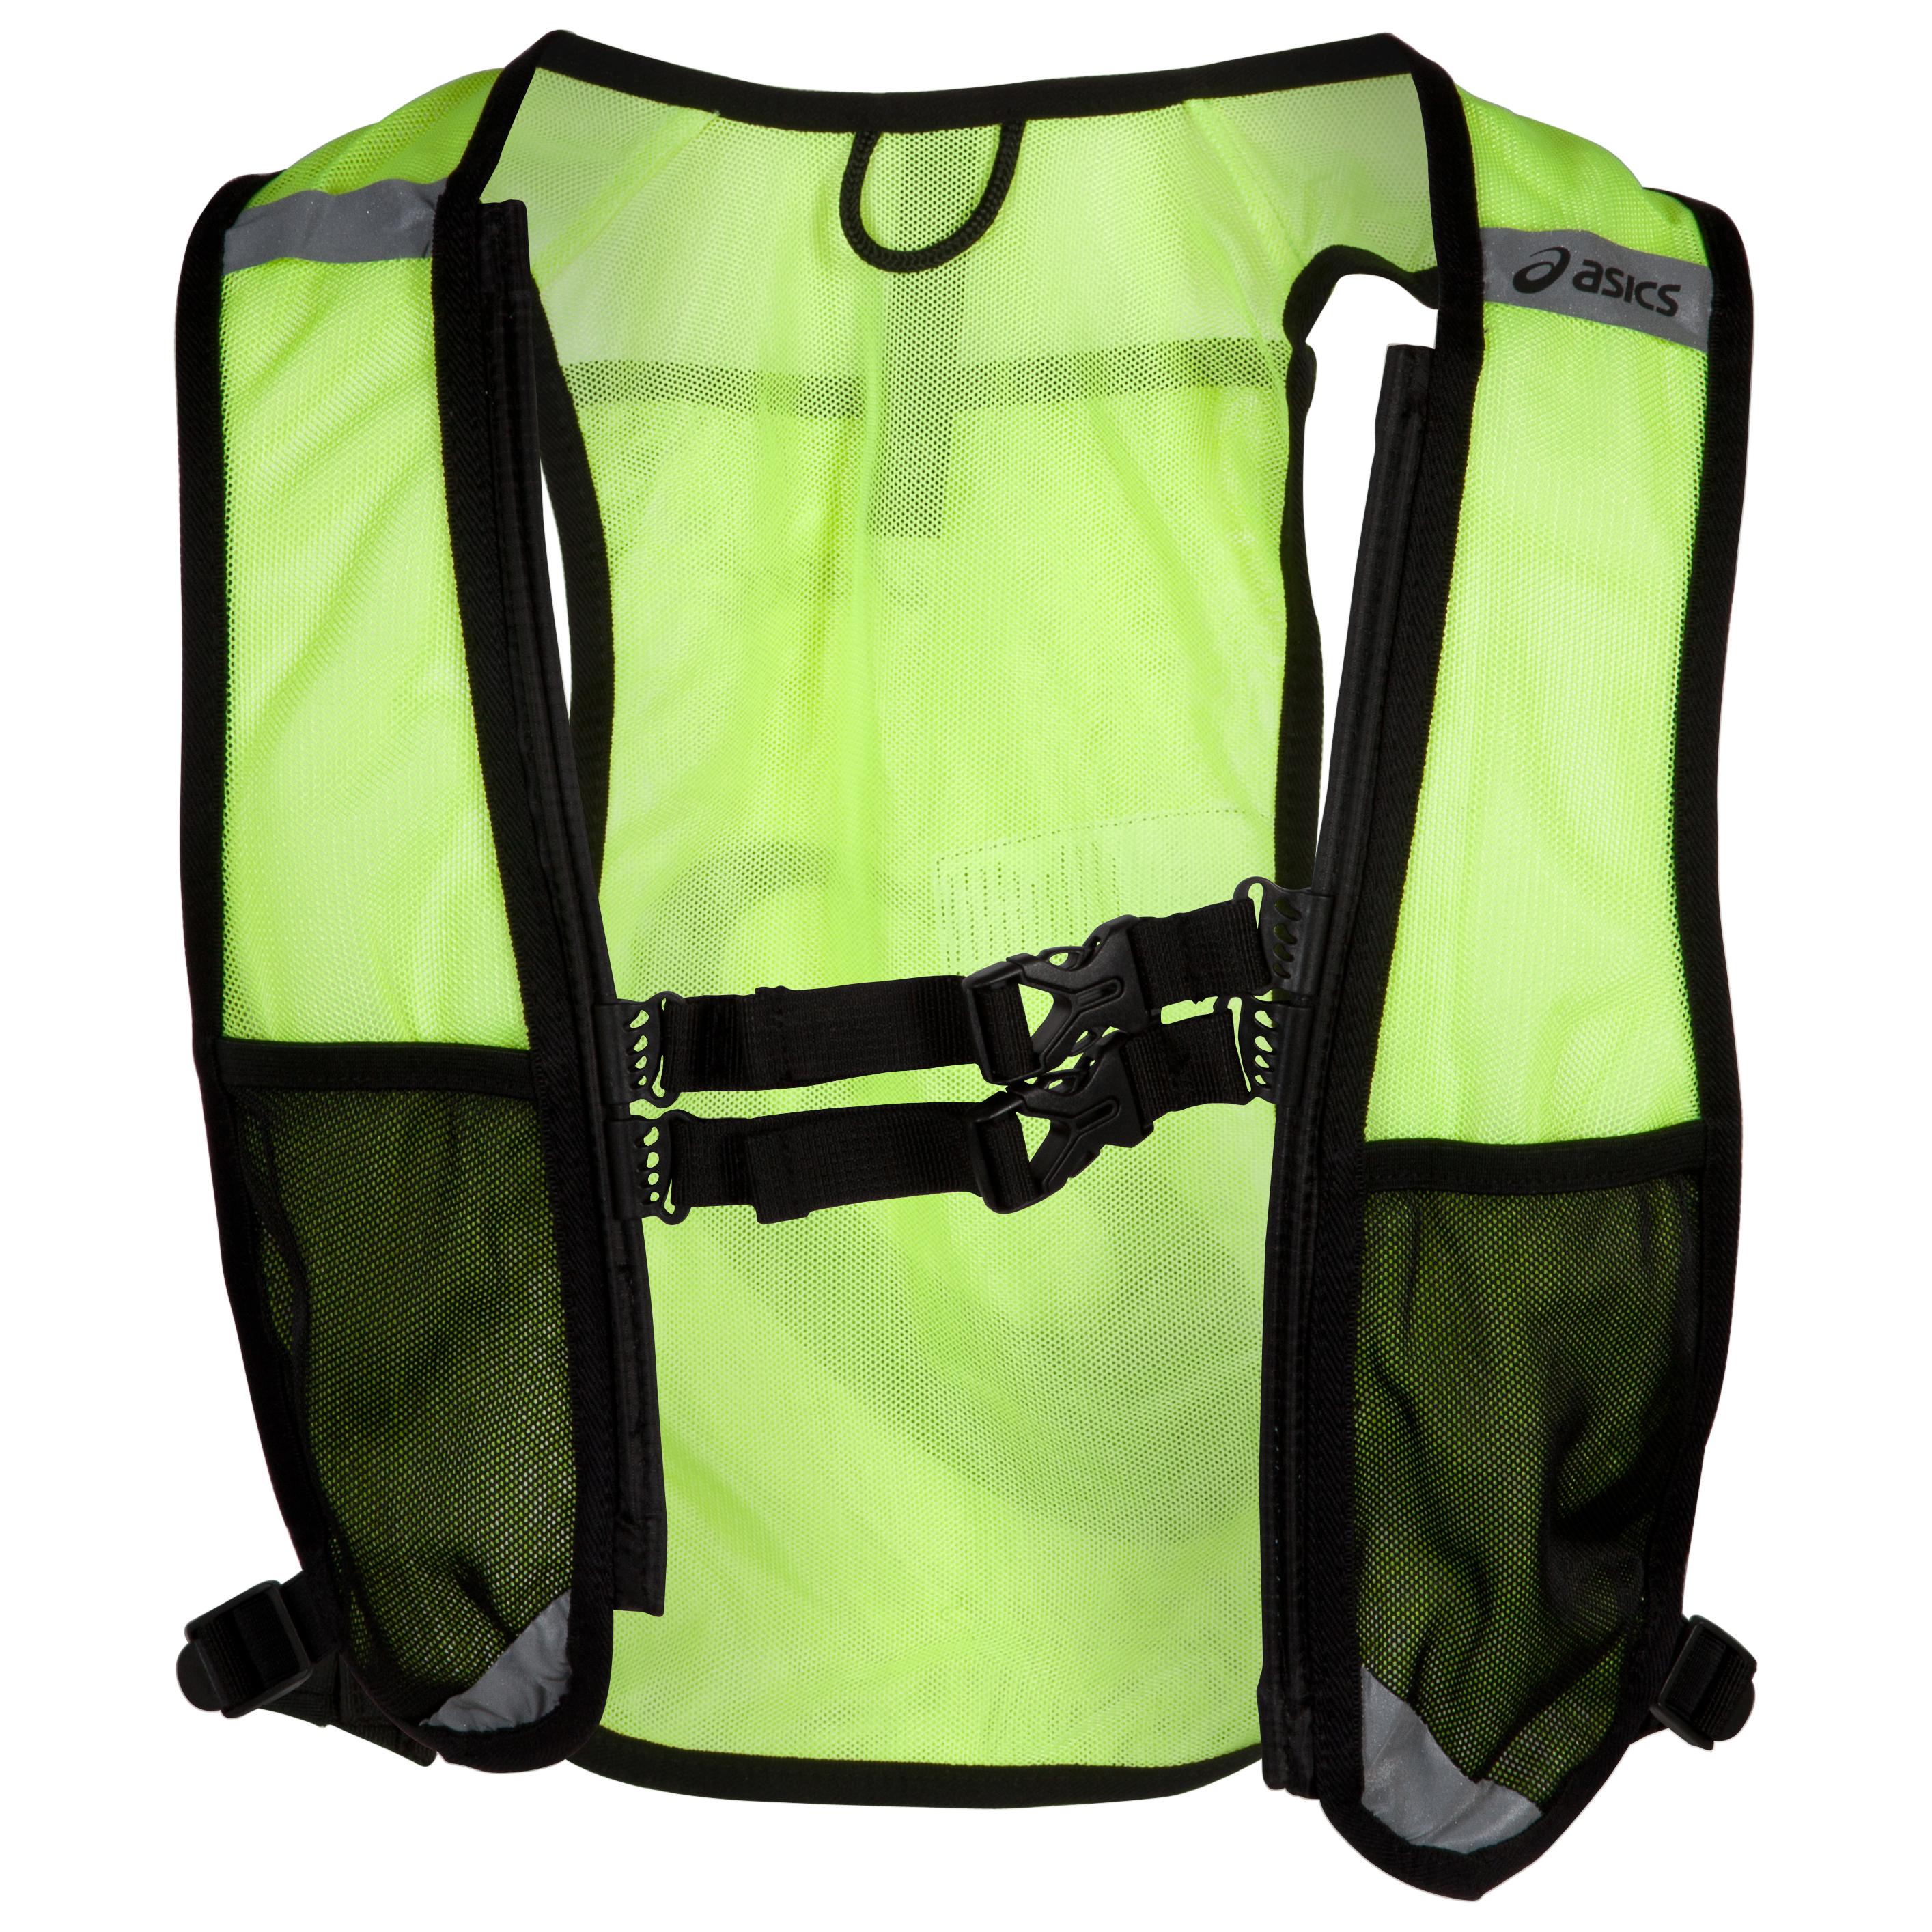 Asics Visible Vestpack - Neon Lime